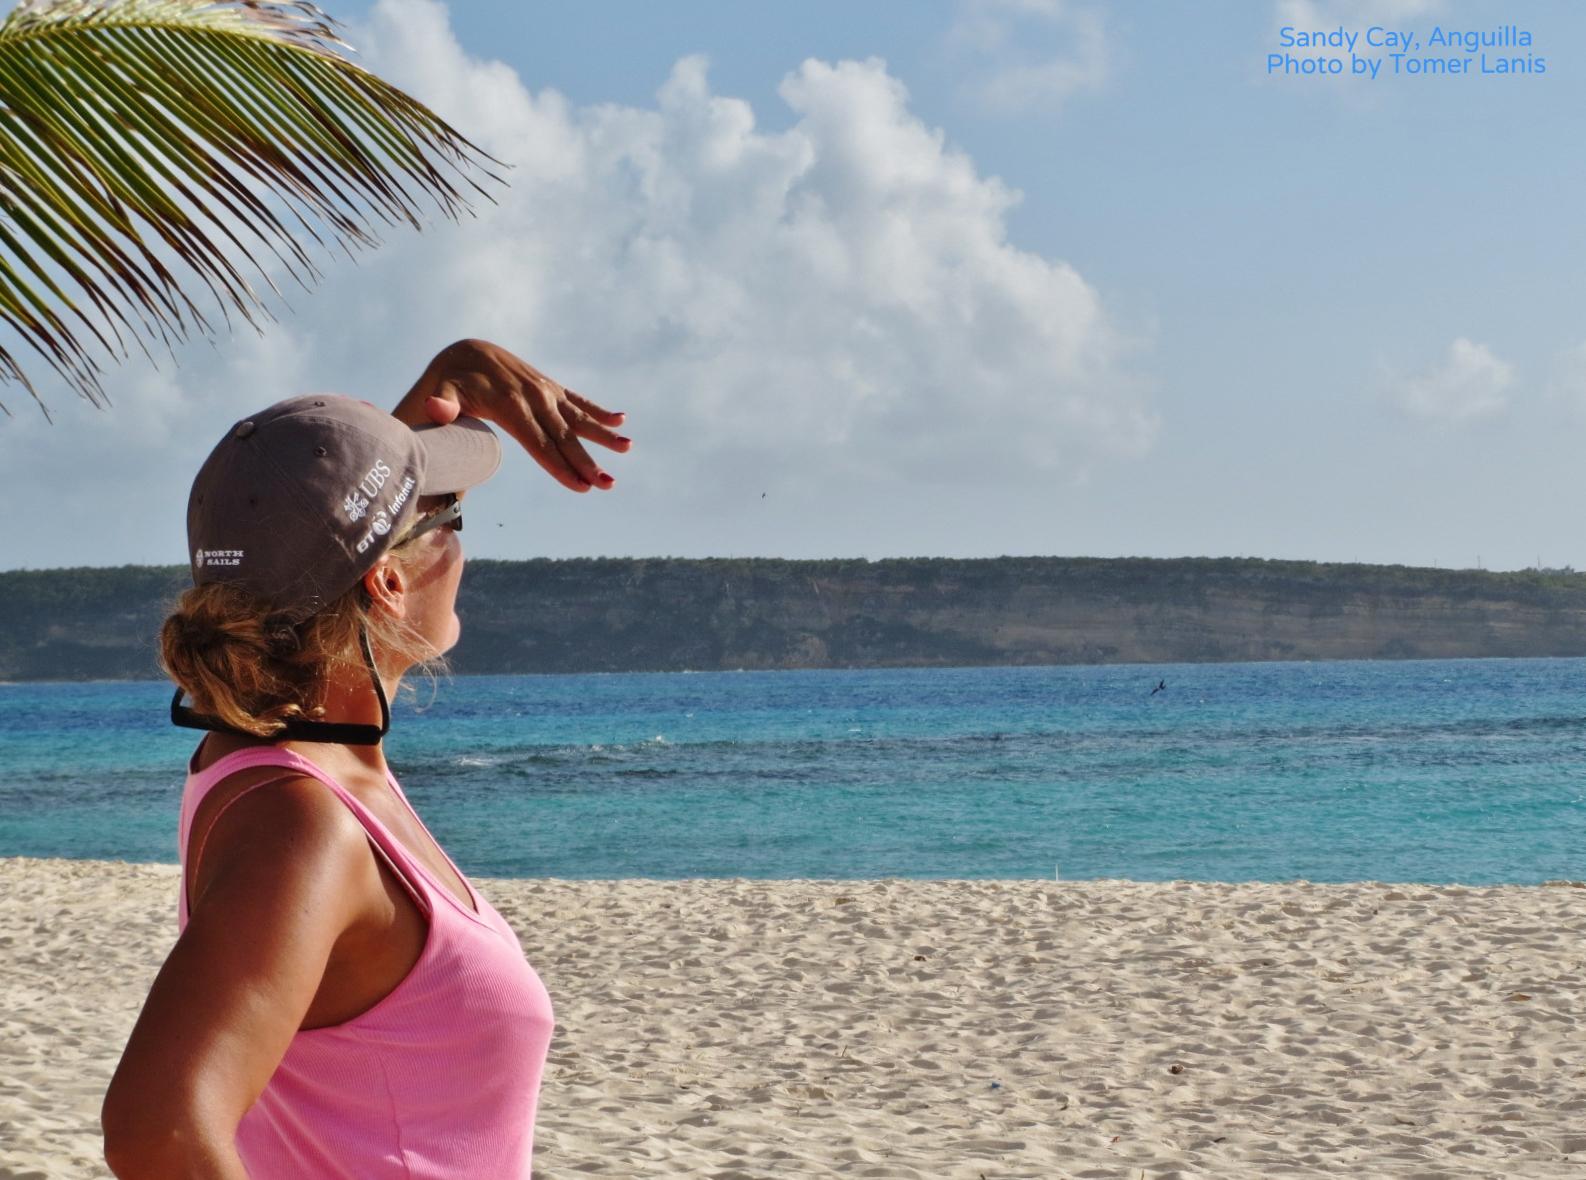 Sandy Cay Anguilla